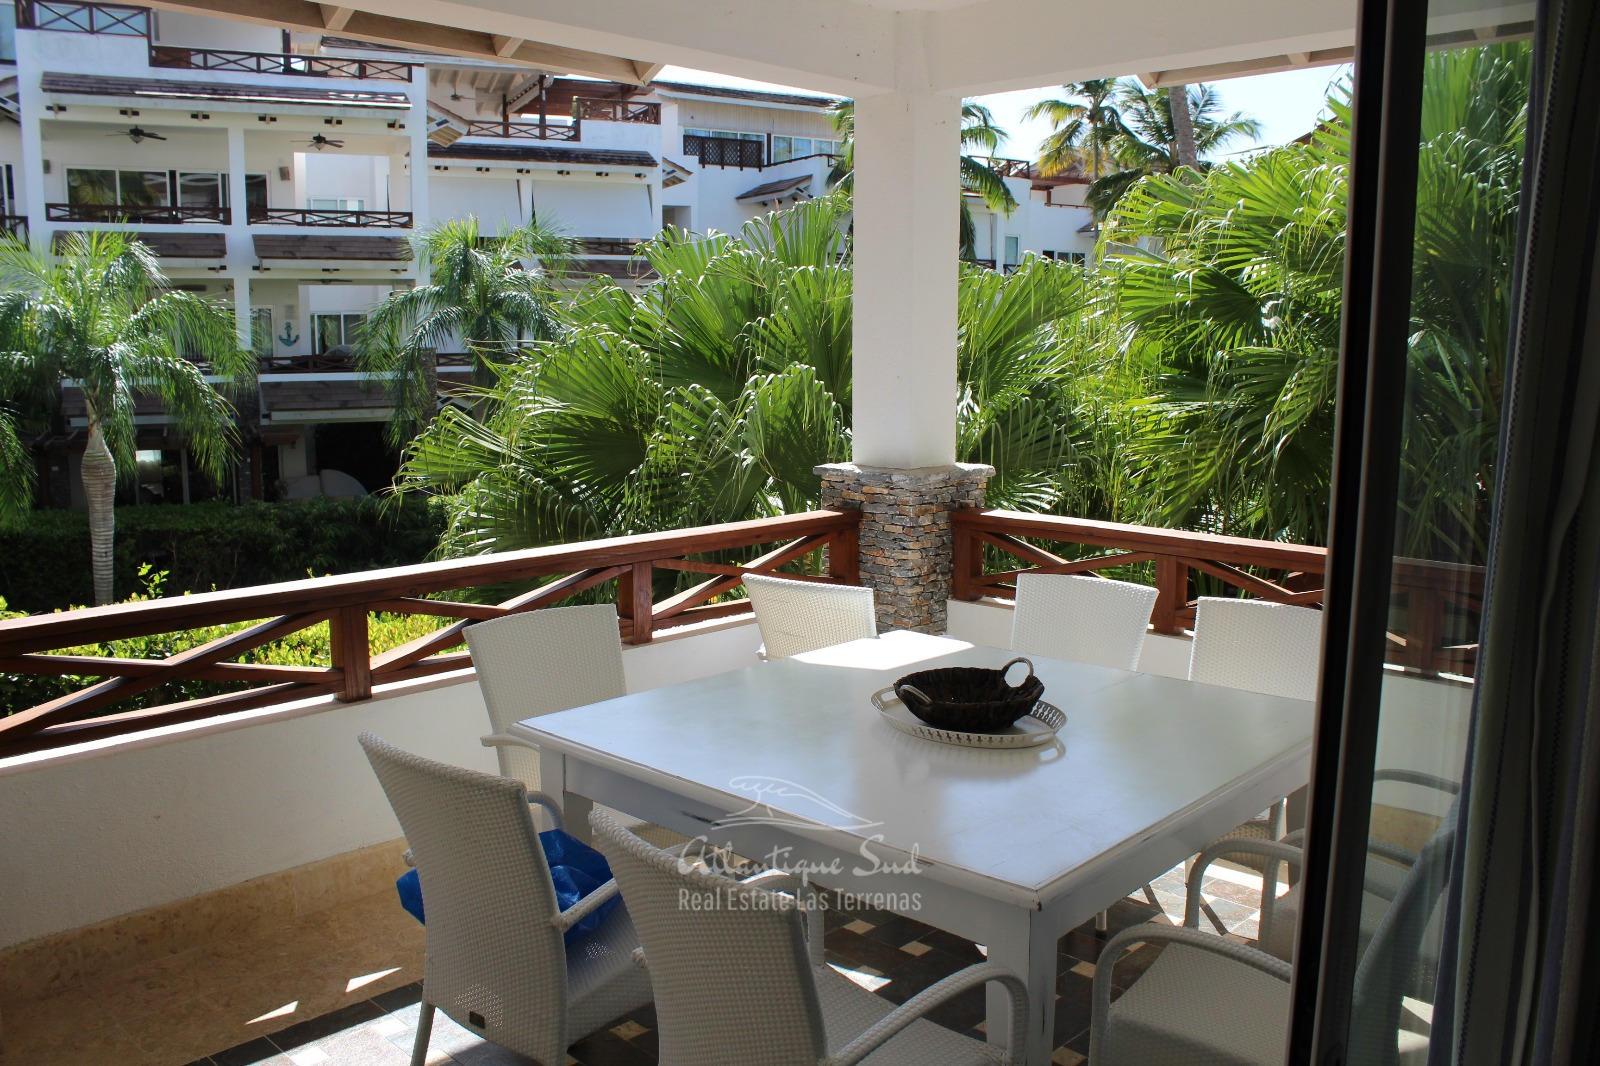 Apartments near the beach real estate las terrenas dominican republic13.jpg